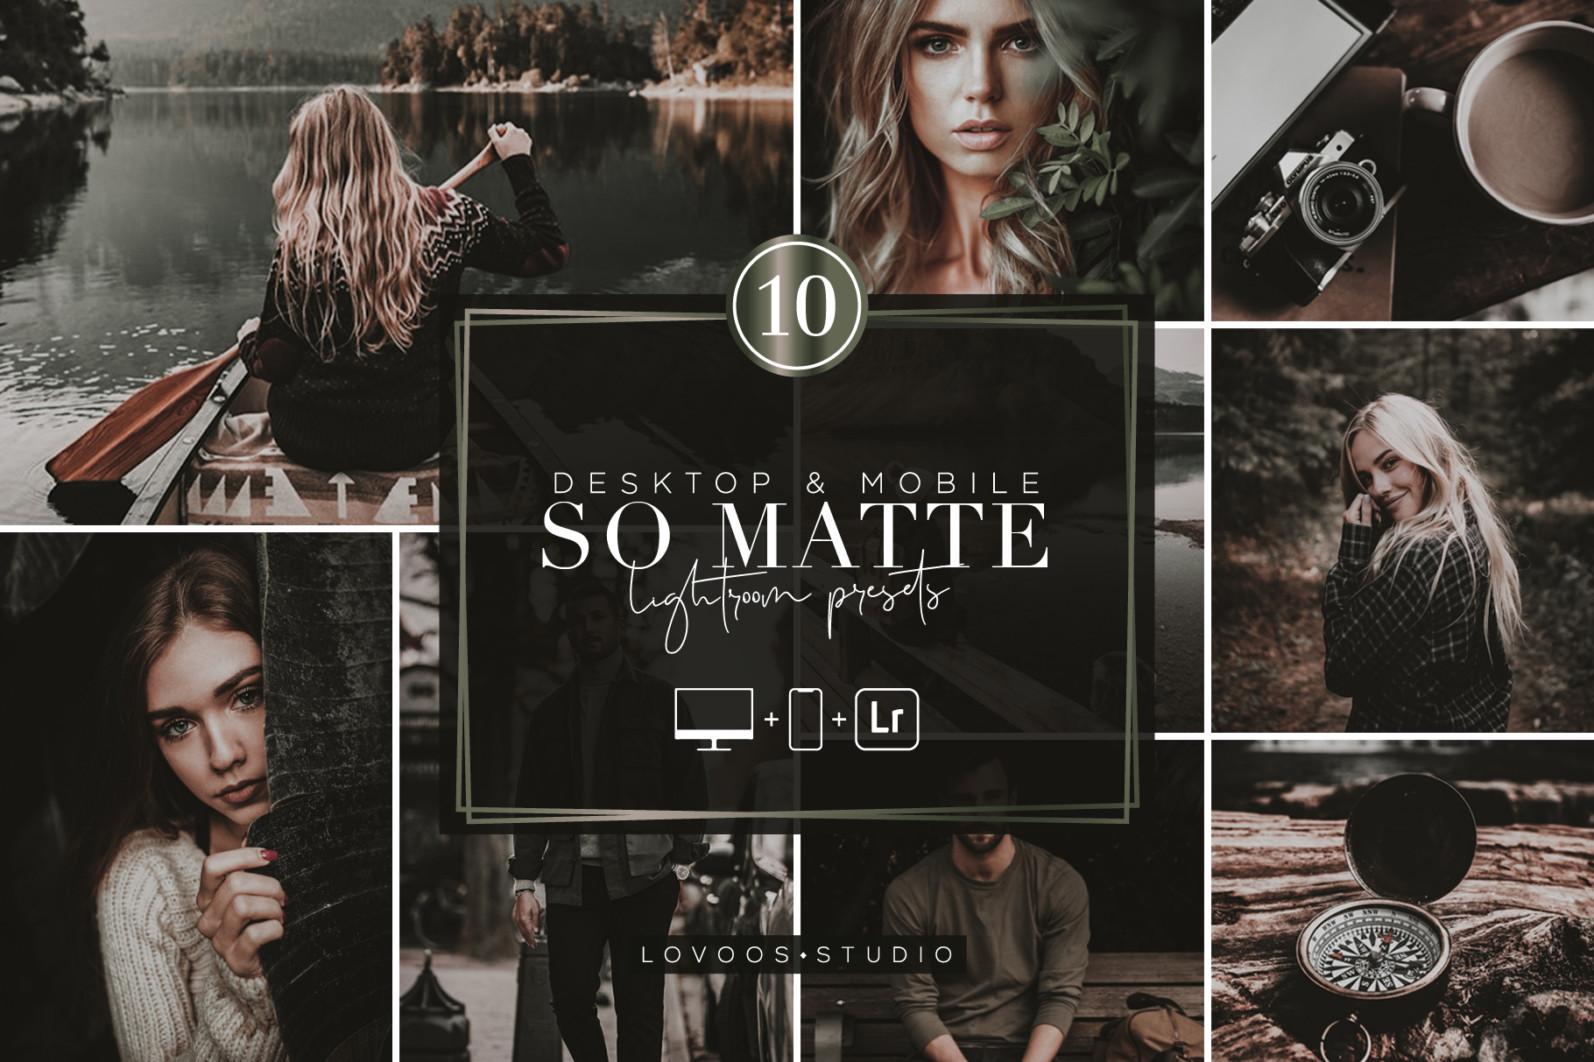 SO MATTE - Lightroom Presets - COV 10 -